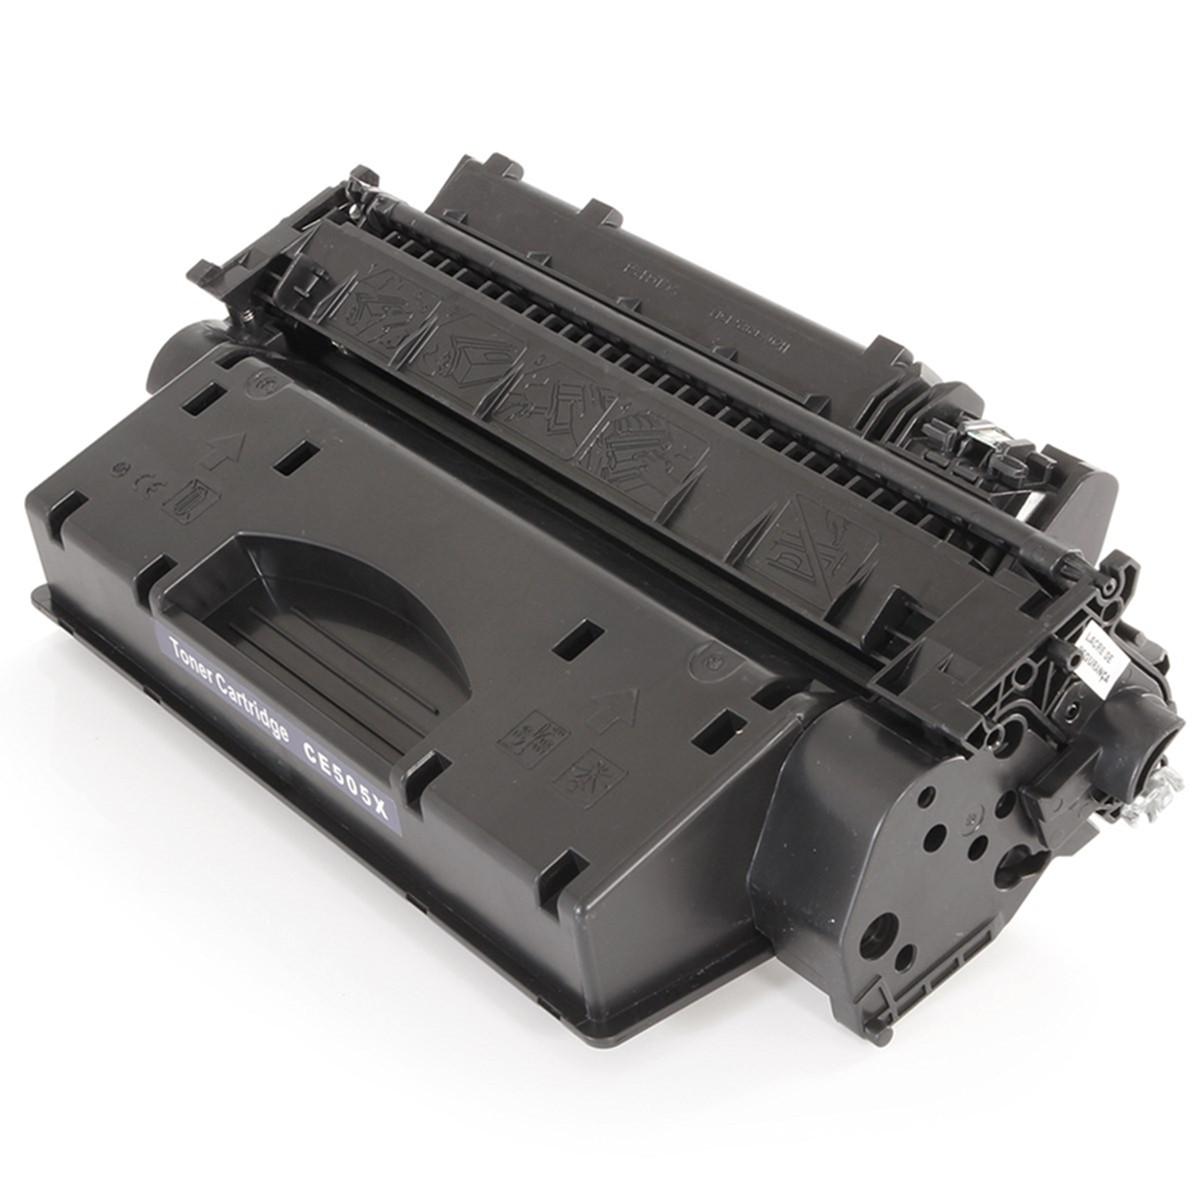 Toner Compatível com HP CF280X   M401 M401DW M401DN M401DNE   Premium 6.5k